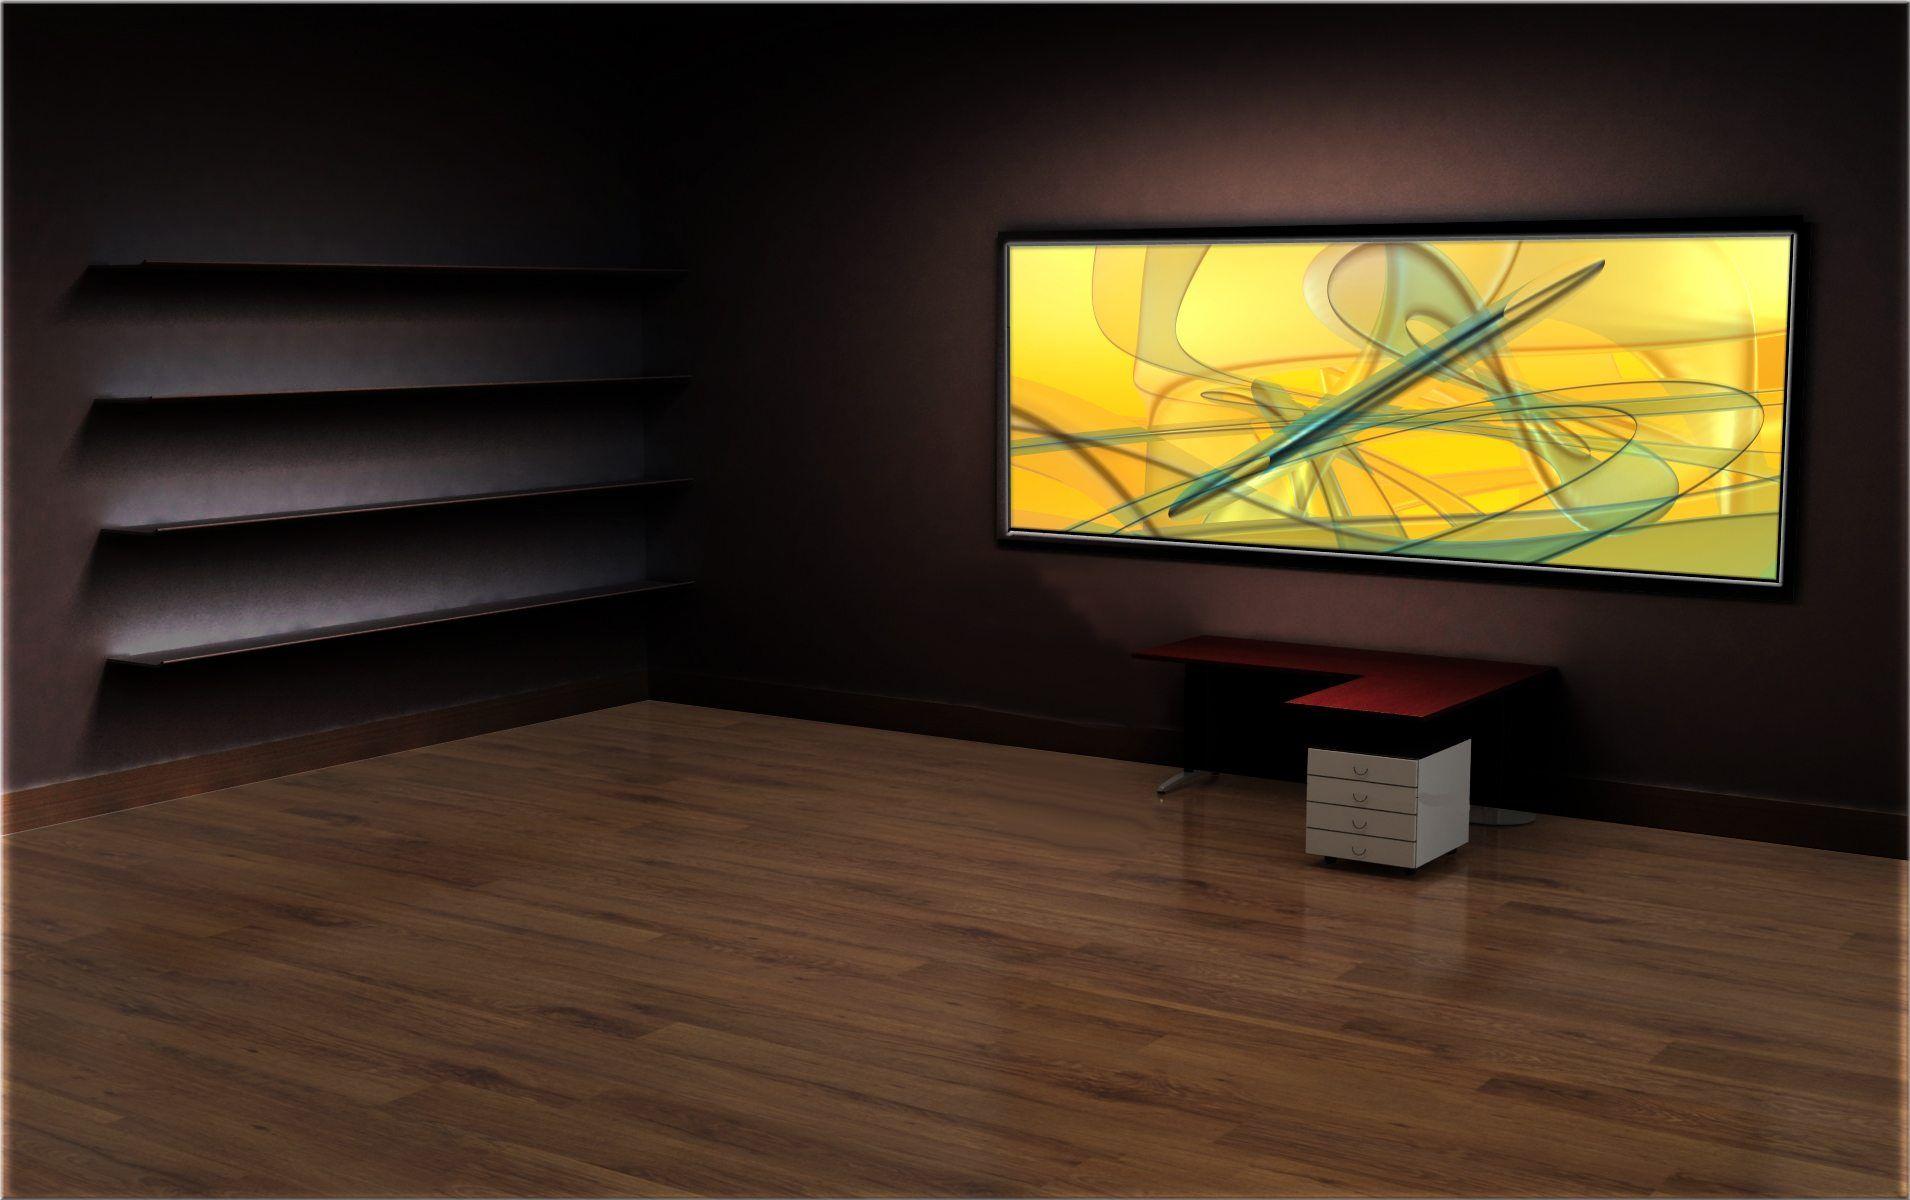 Classic 3d Desktop Workplace Wallpaper Office Desktop Backgrounds Type B Hd Wallpaper From